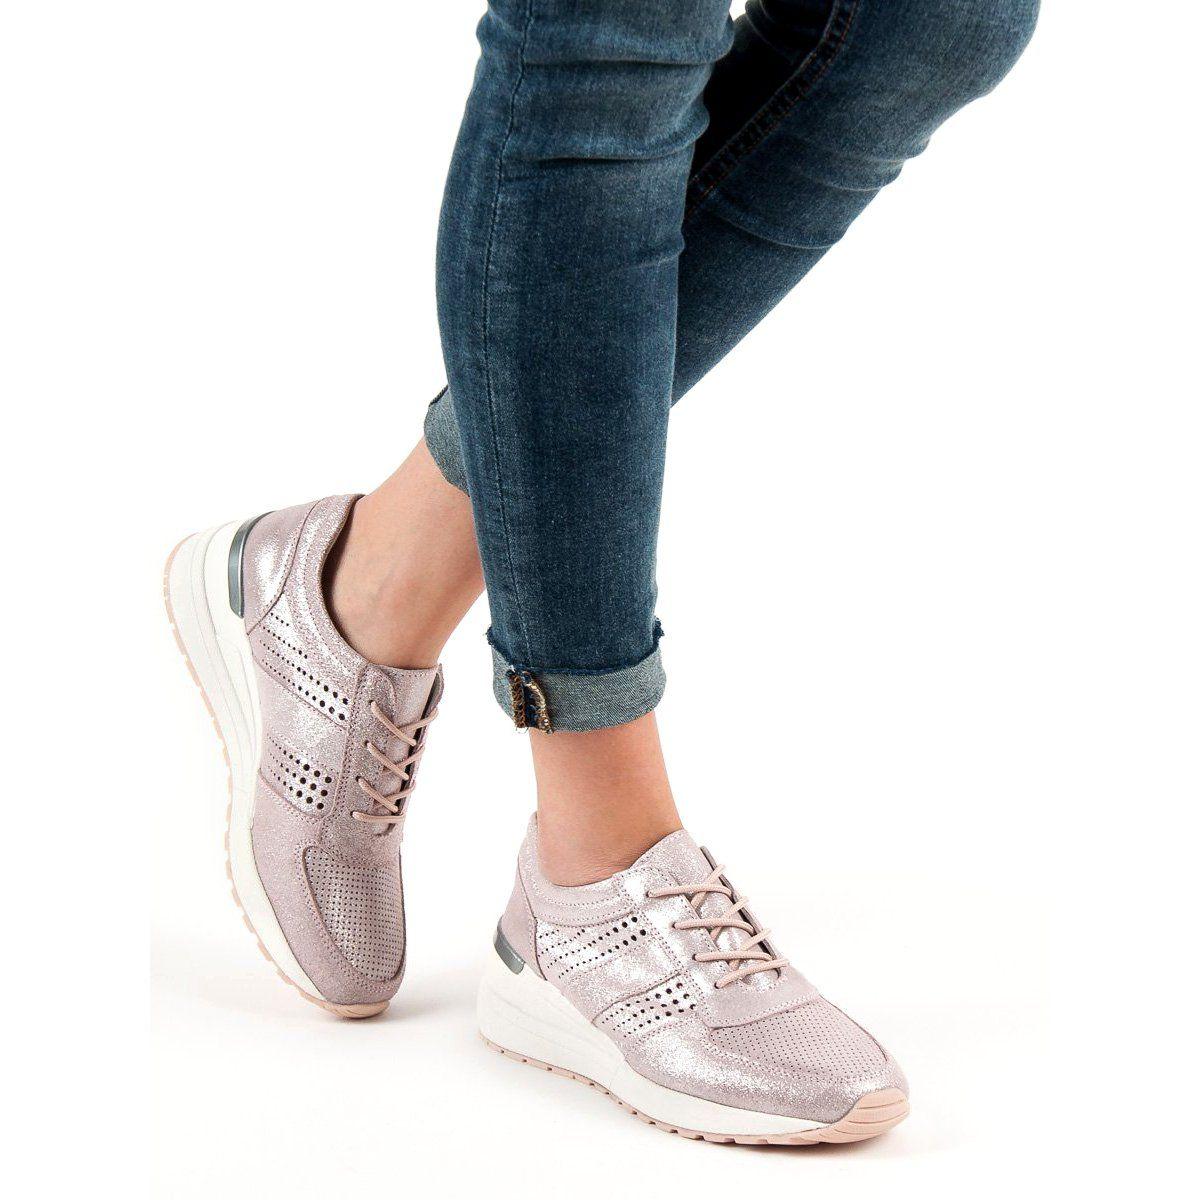 Filippo Skorzane Sneakersy Na Koturnie Rozowe Tretorn Sneaker Sneakers Shoes